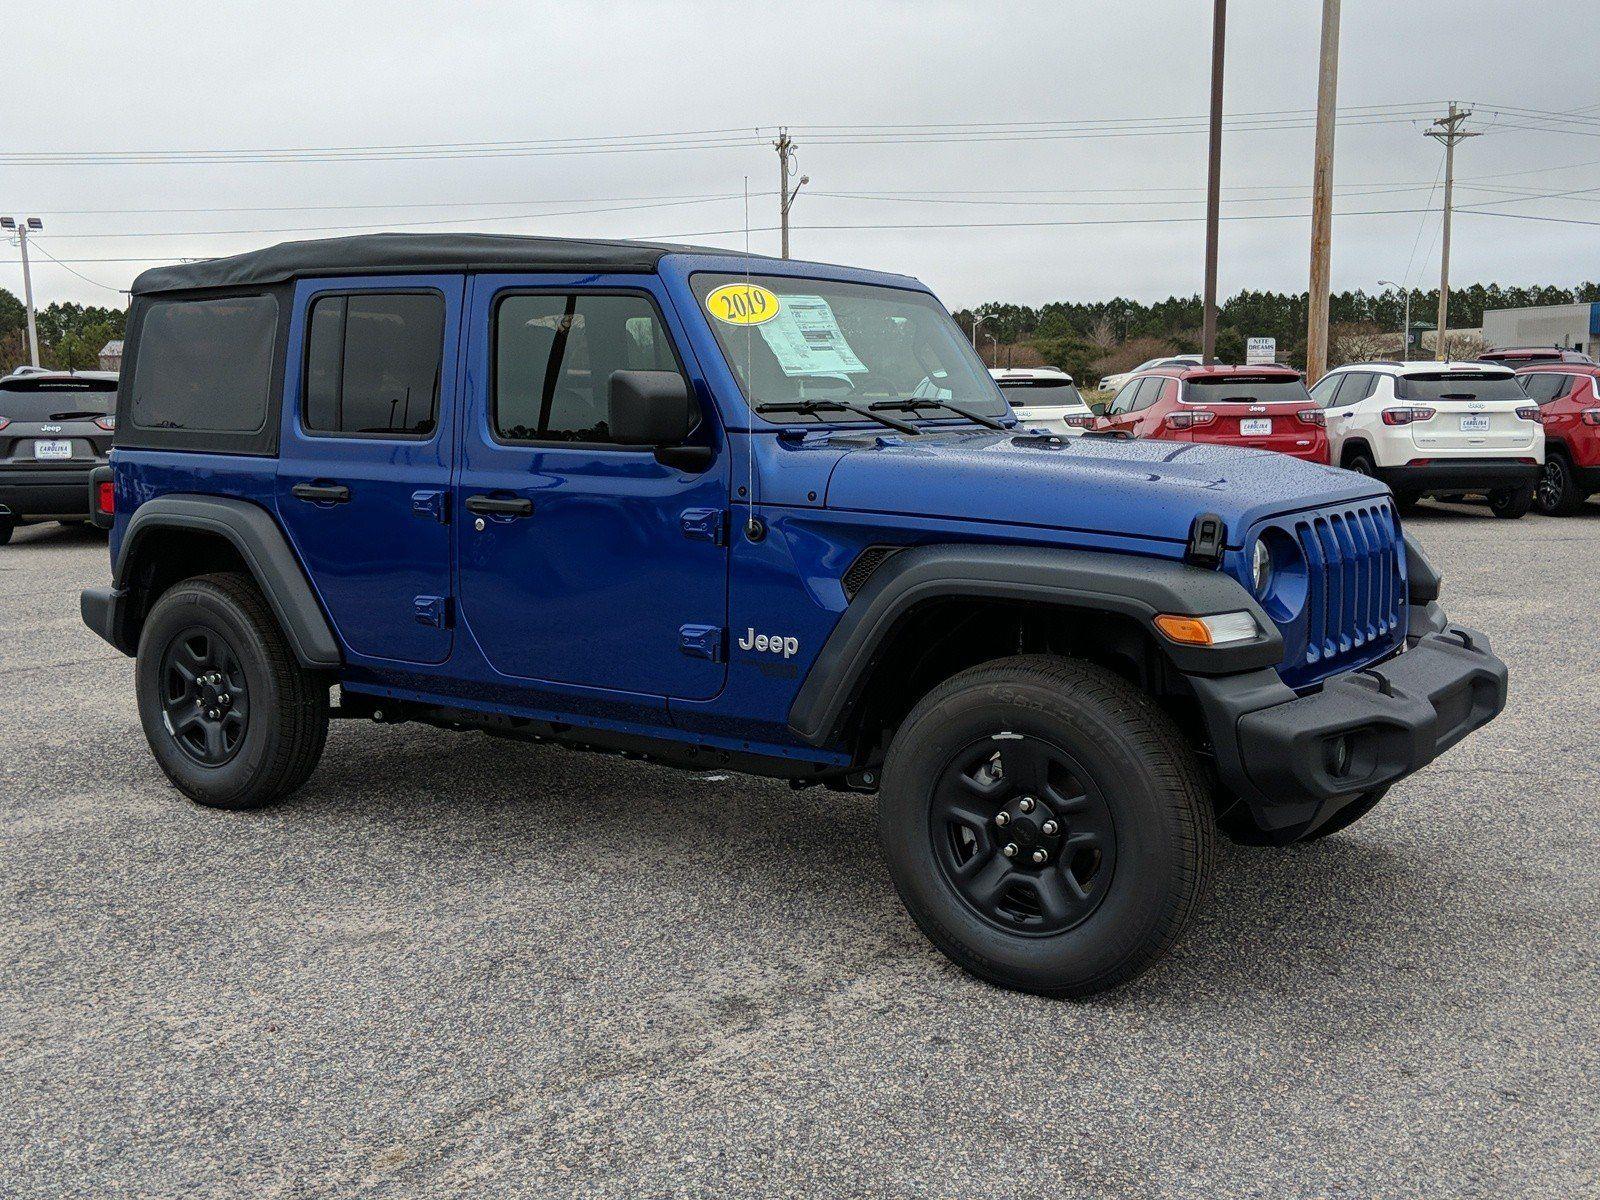 102 New Cdjr Vehicles In Stock Jeep Wrangler Chrysler Dodge Jeep Jeep